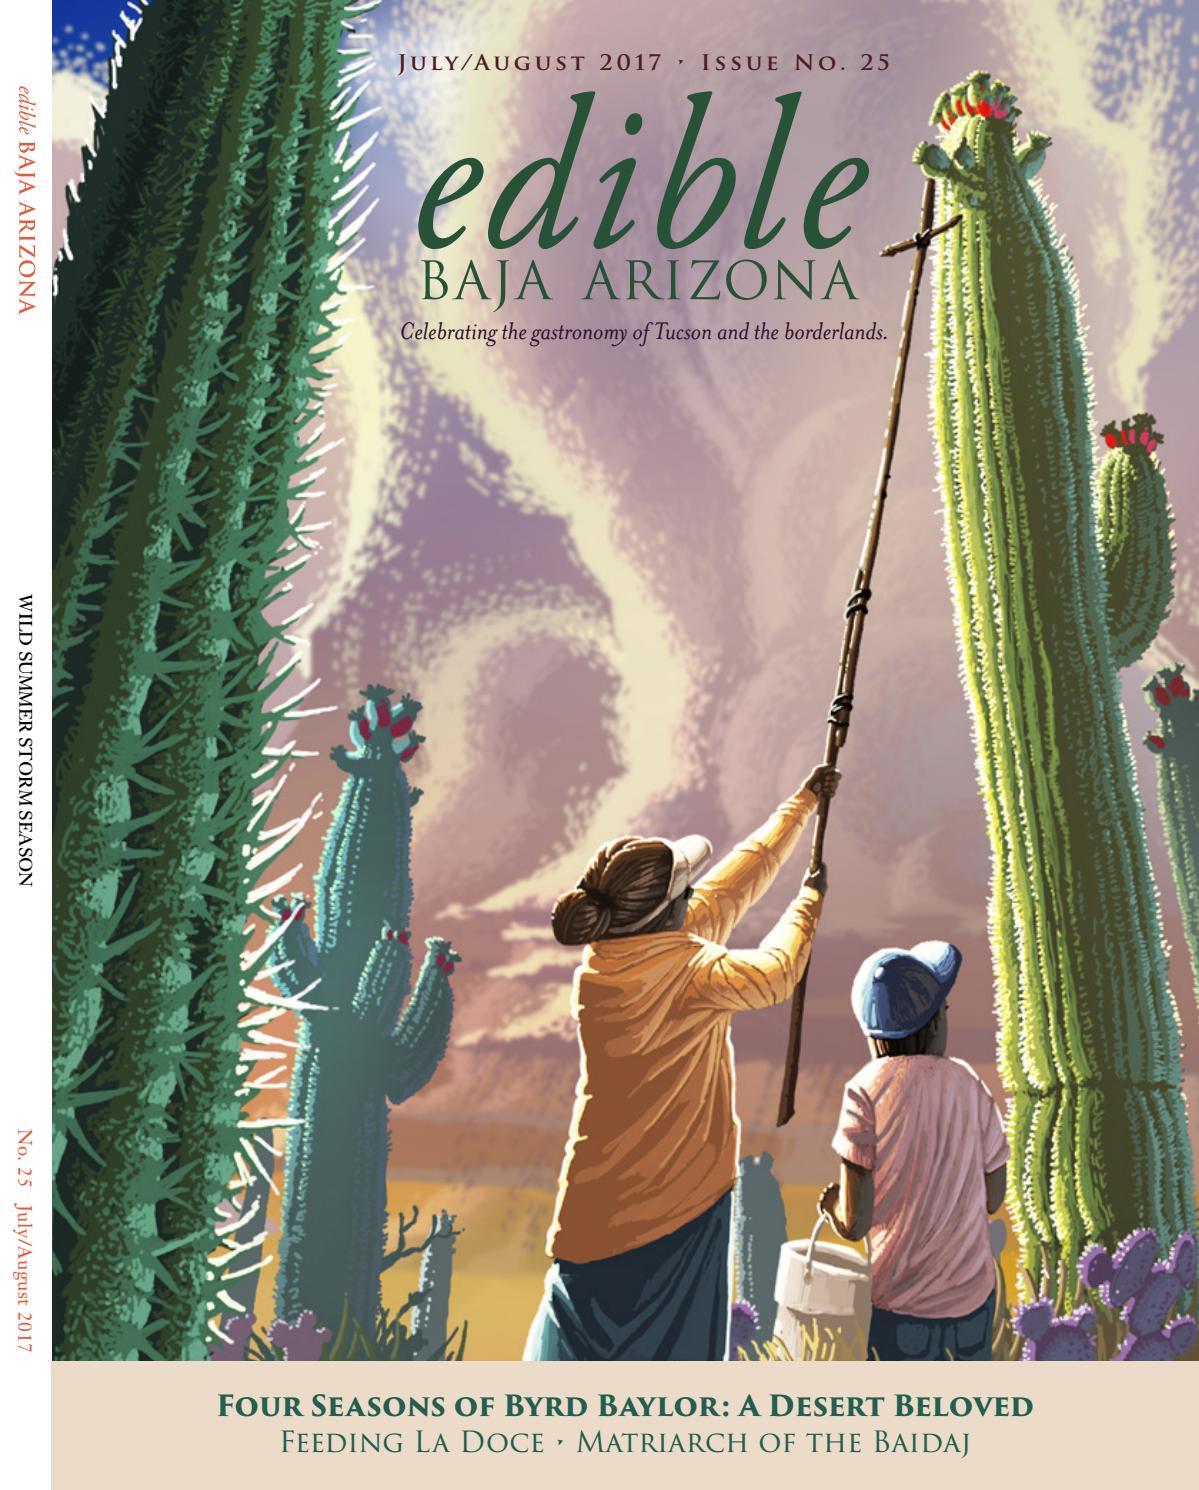 Edible Baja Arizona - July/August 2017 by Edible Baja Arizona - issuu